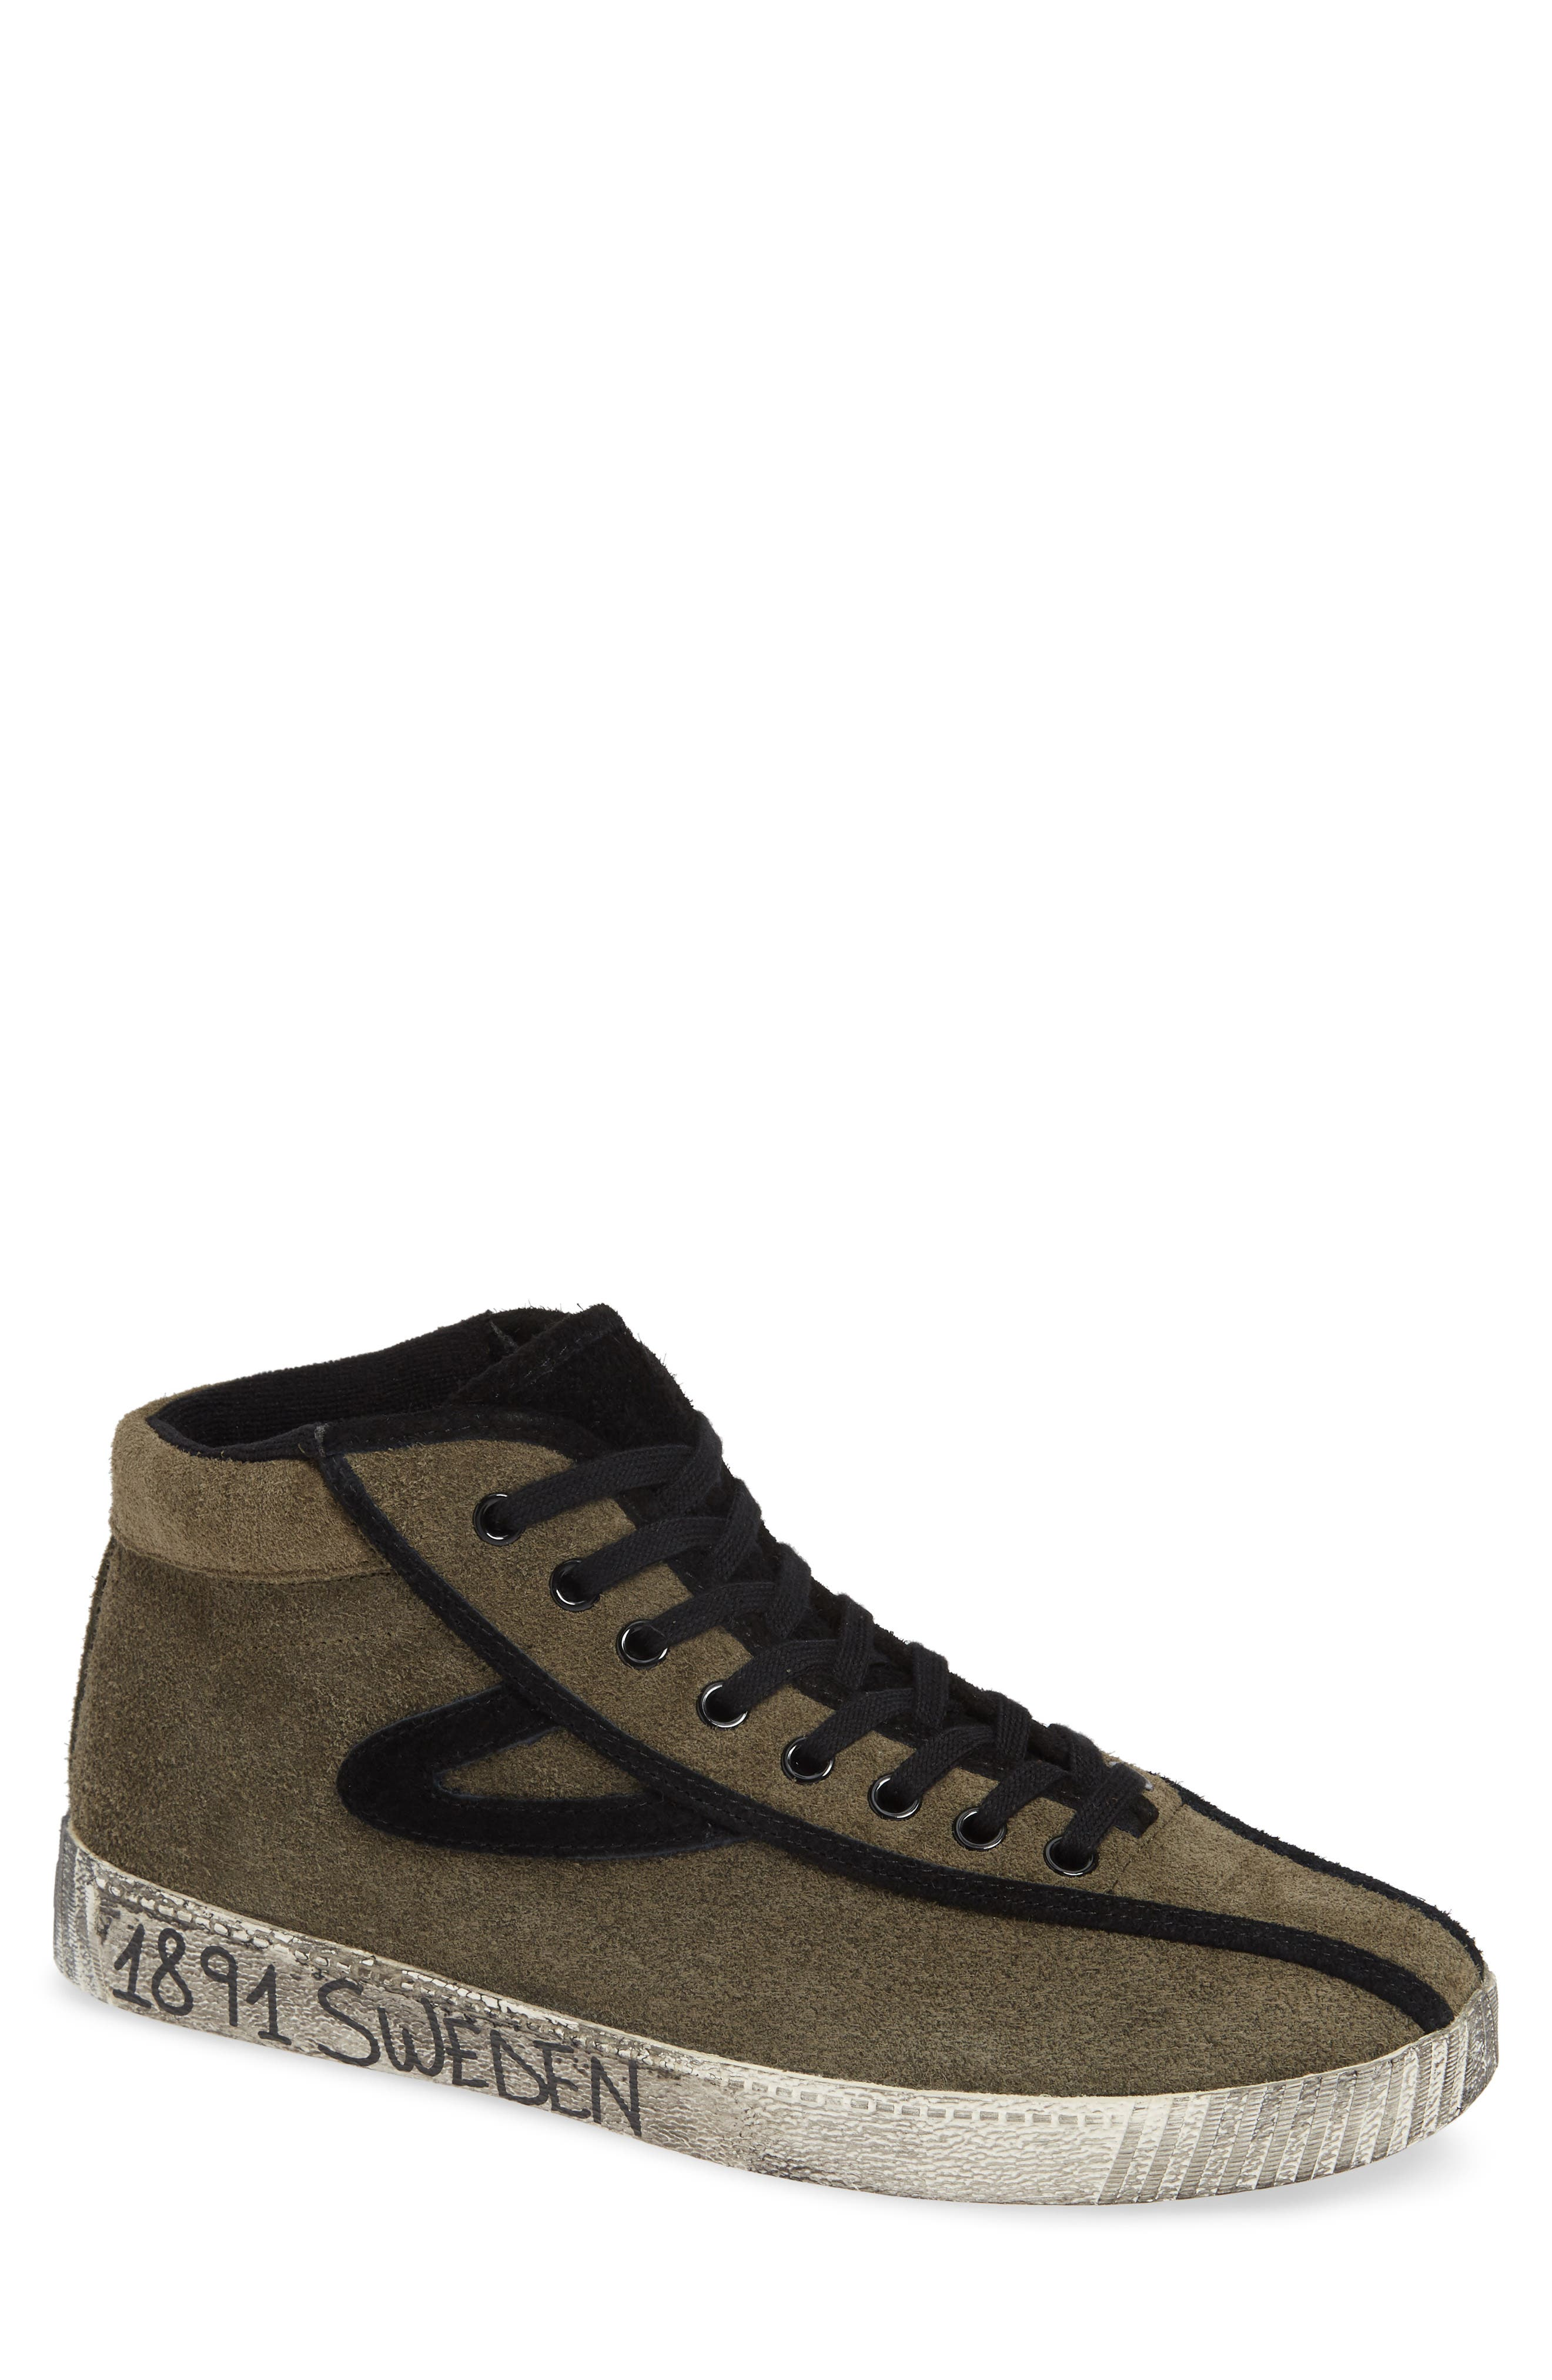 Nylite Hi 21 High Top Sneaker,                         Main,                         color, OLIVE/ BLACK SUEDE